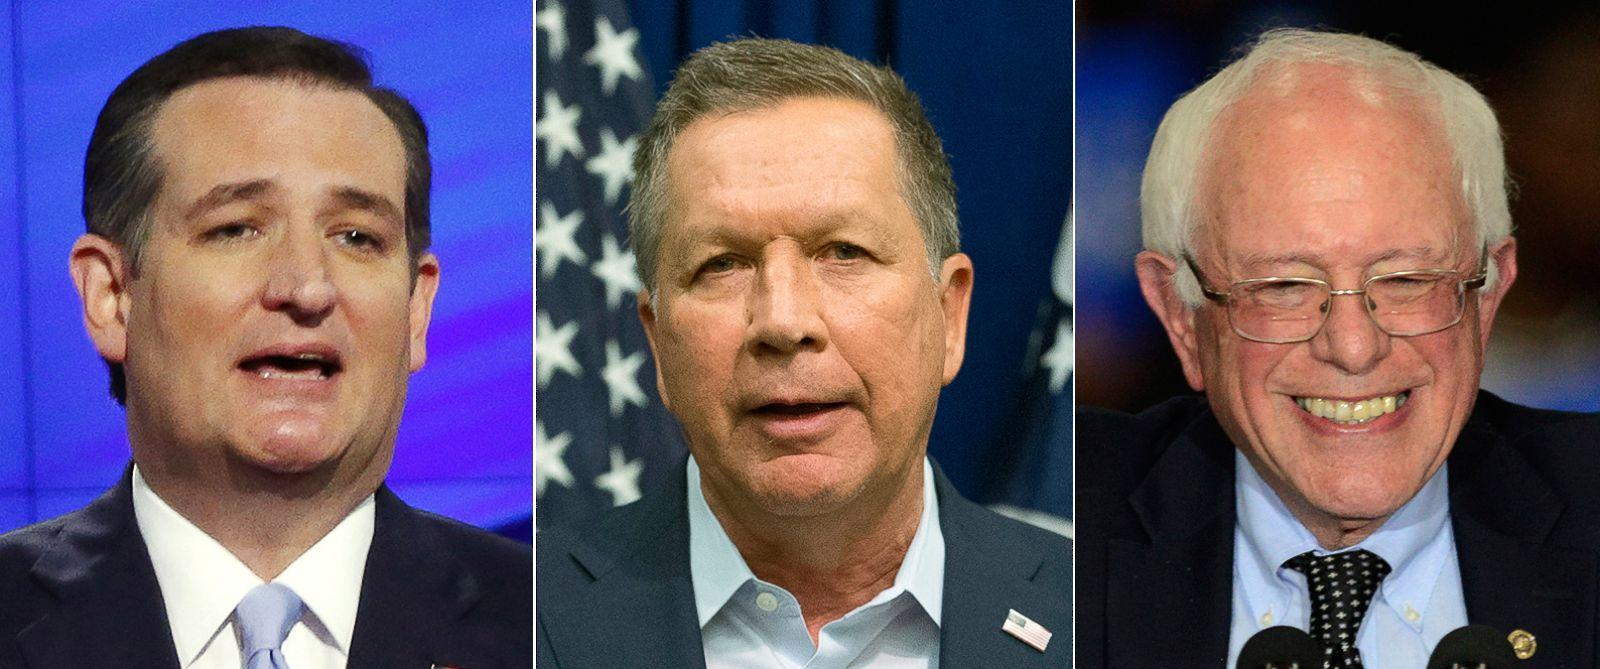 PHOTO: (L-R) Ted Cruz in Coral Gables, Fla., March 10, 2016, John Kasich in Cincinnati, March 12, 2016 and Bernie Sanders in Summit, Ill., March 11, 2016.